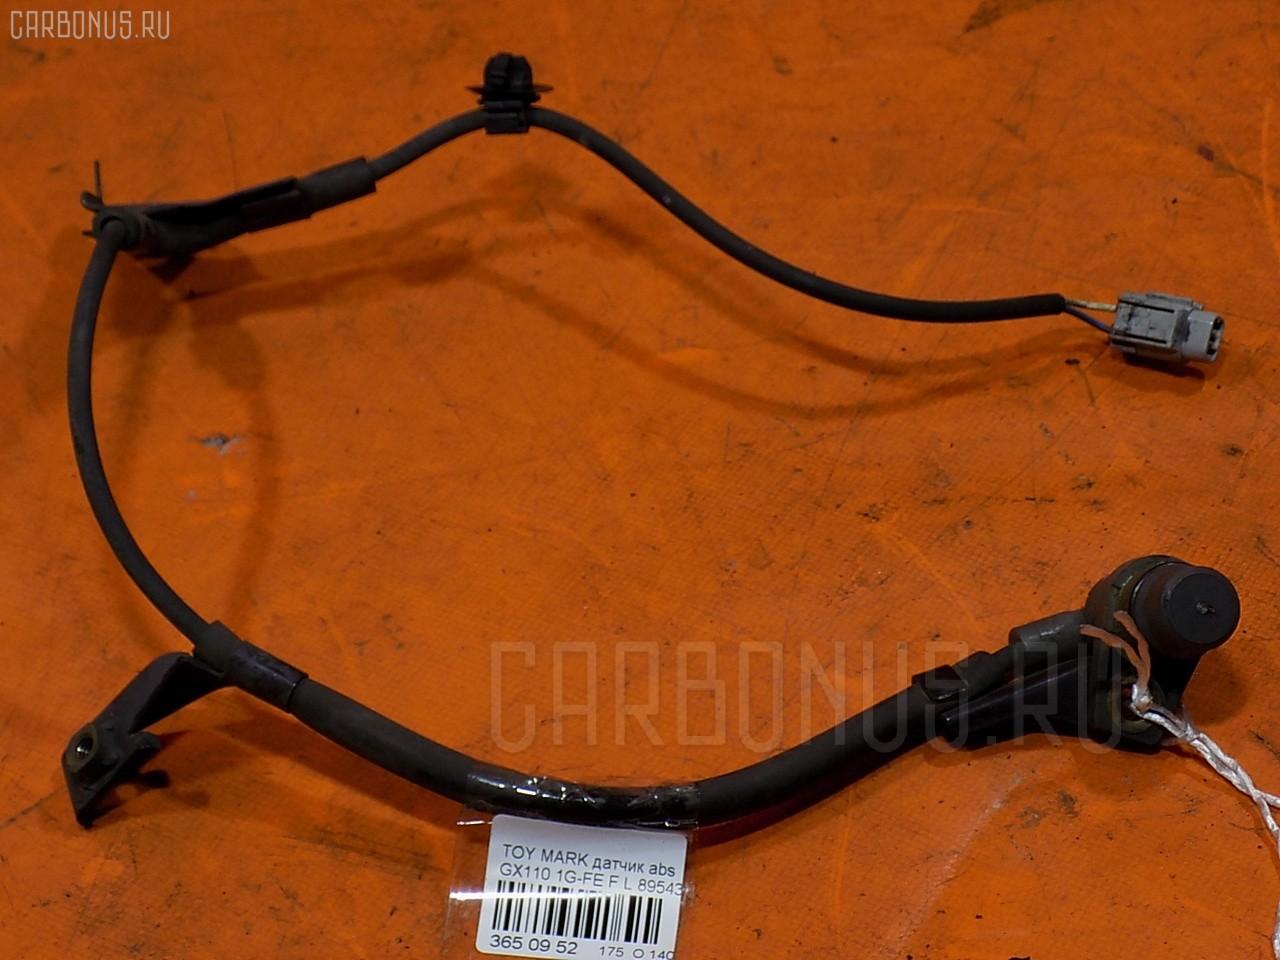 Датчик ABS 89543-30230 на Toyota Mark Ii GX110 1G-FE Фото 1